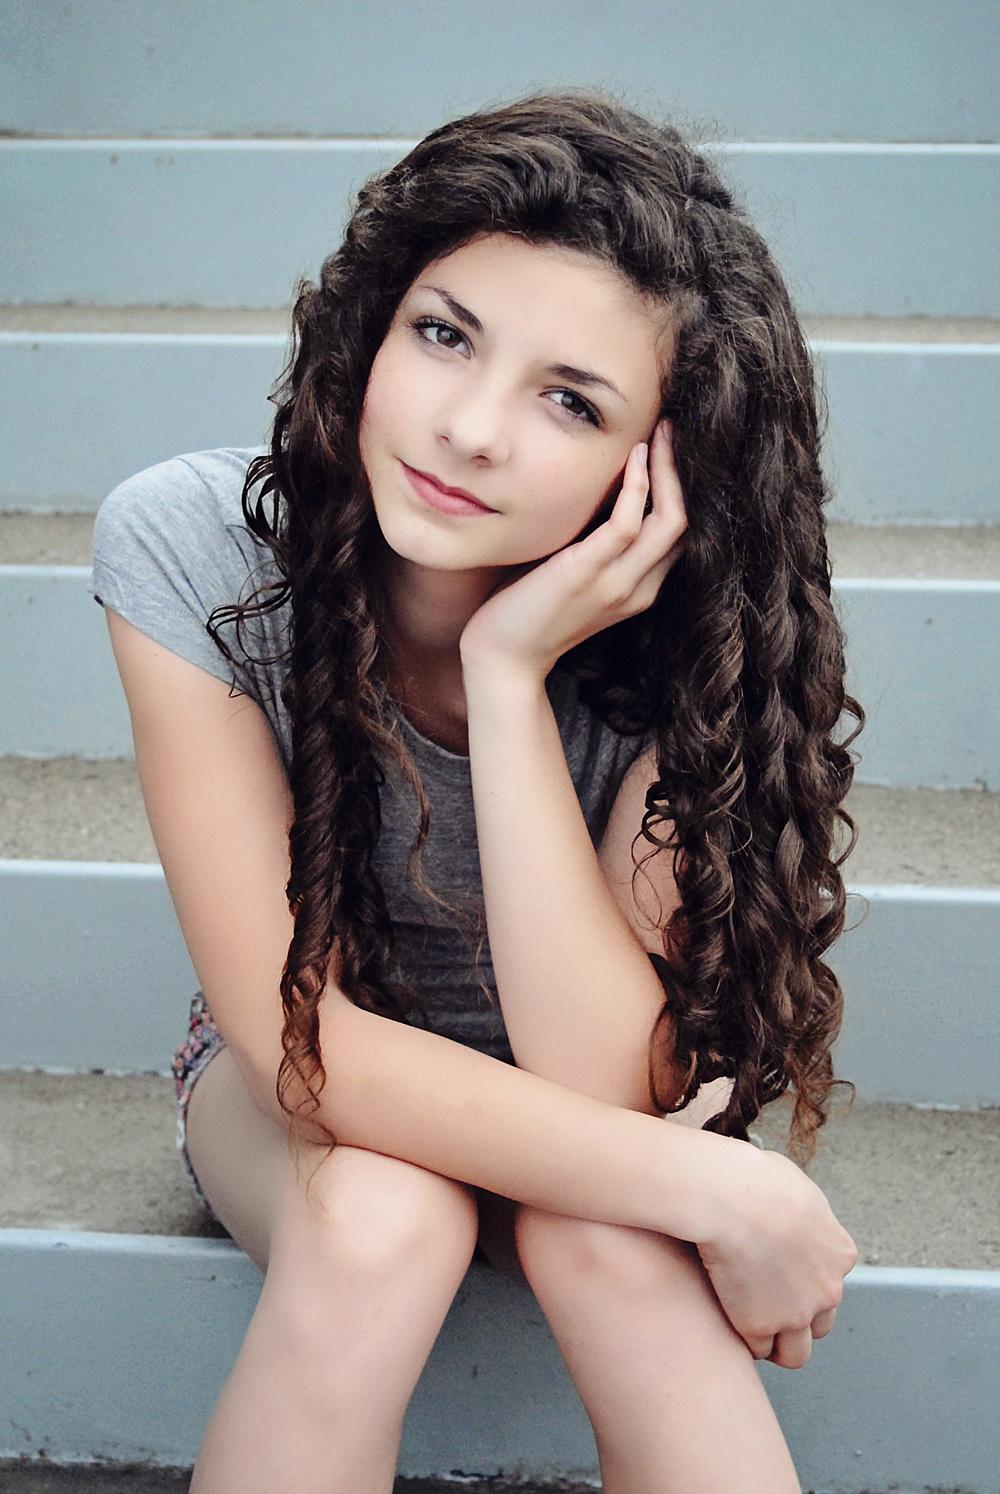 Mikayla Morales